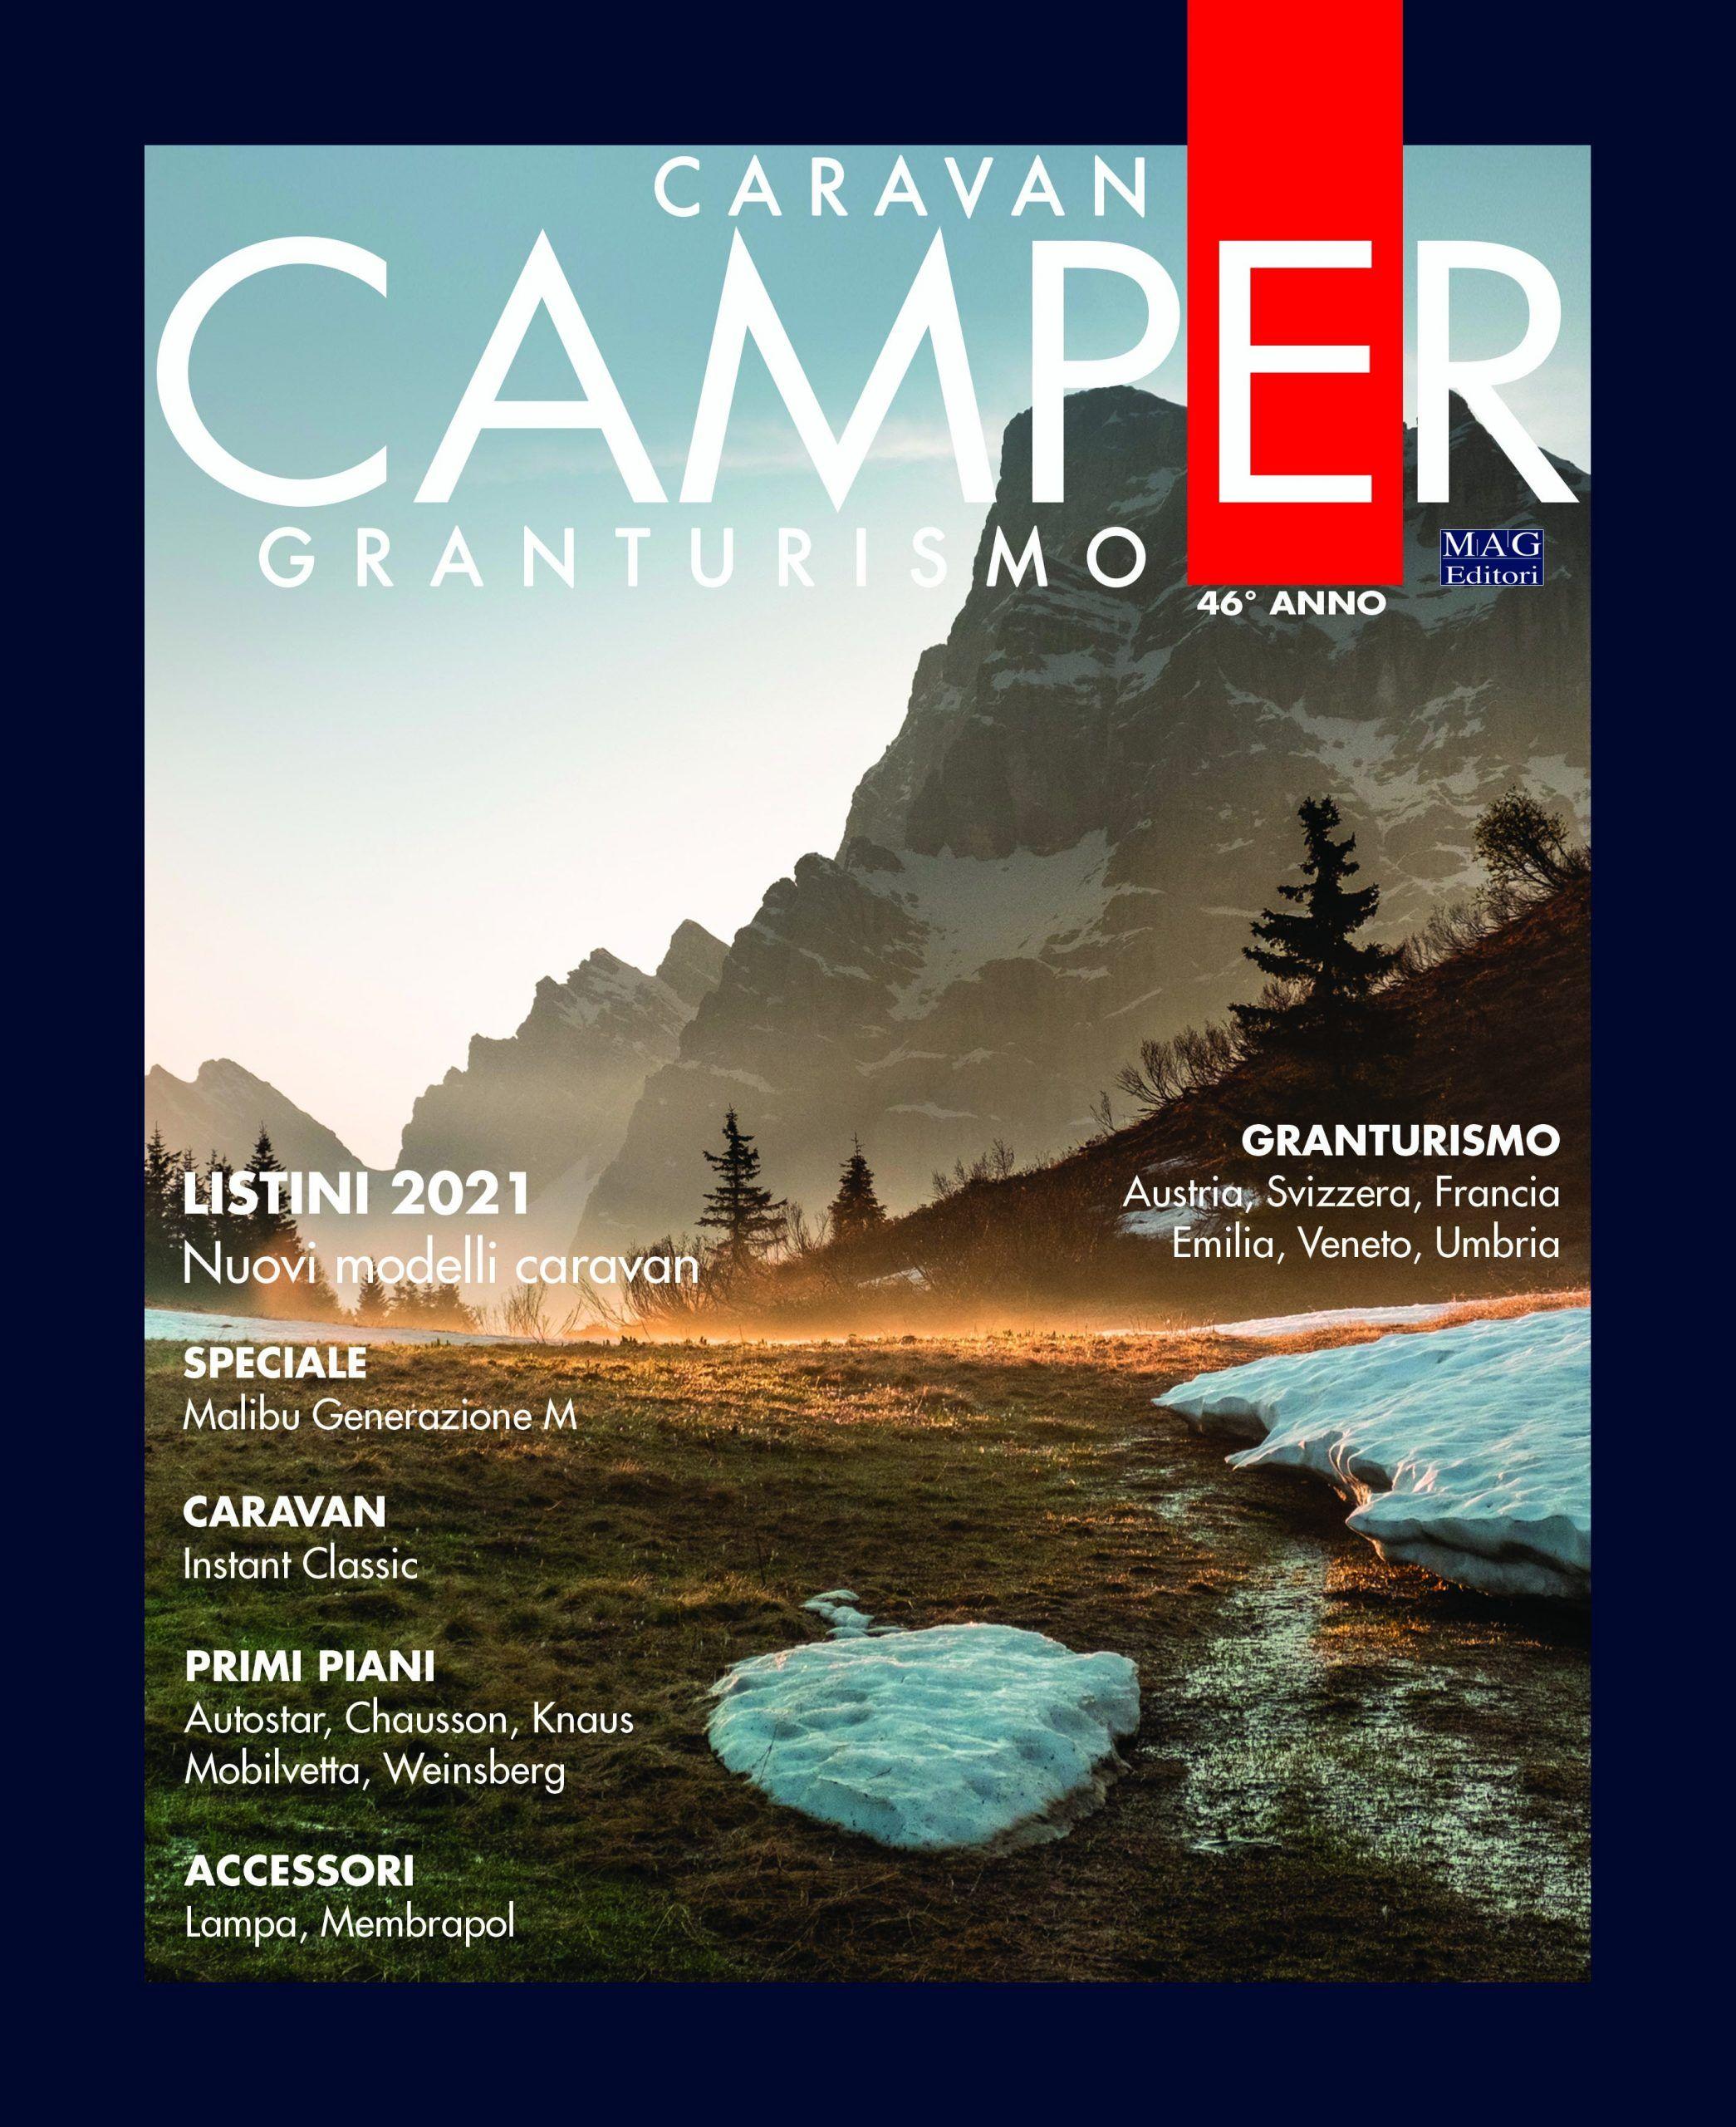 Acqua E Aria Rivista.Caravan E Camper Granturismo La Rivista Per Camperisti E Caravanisti